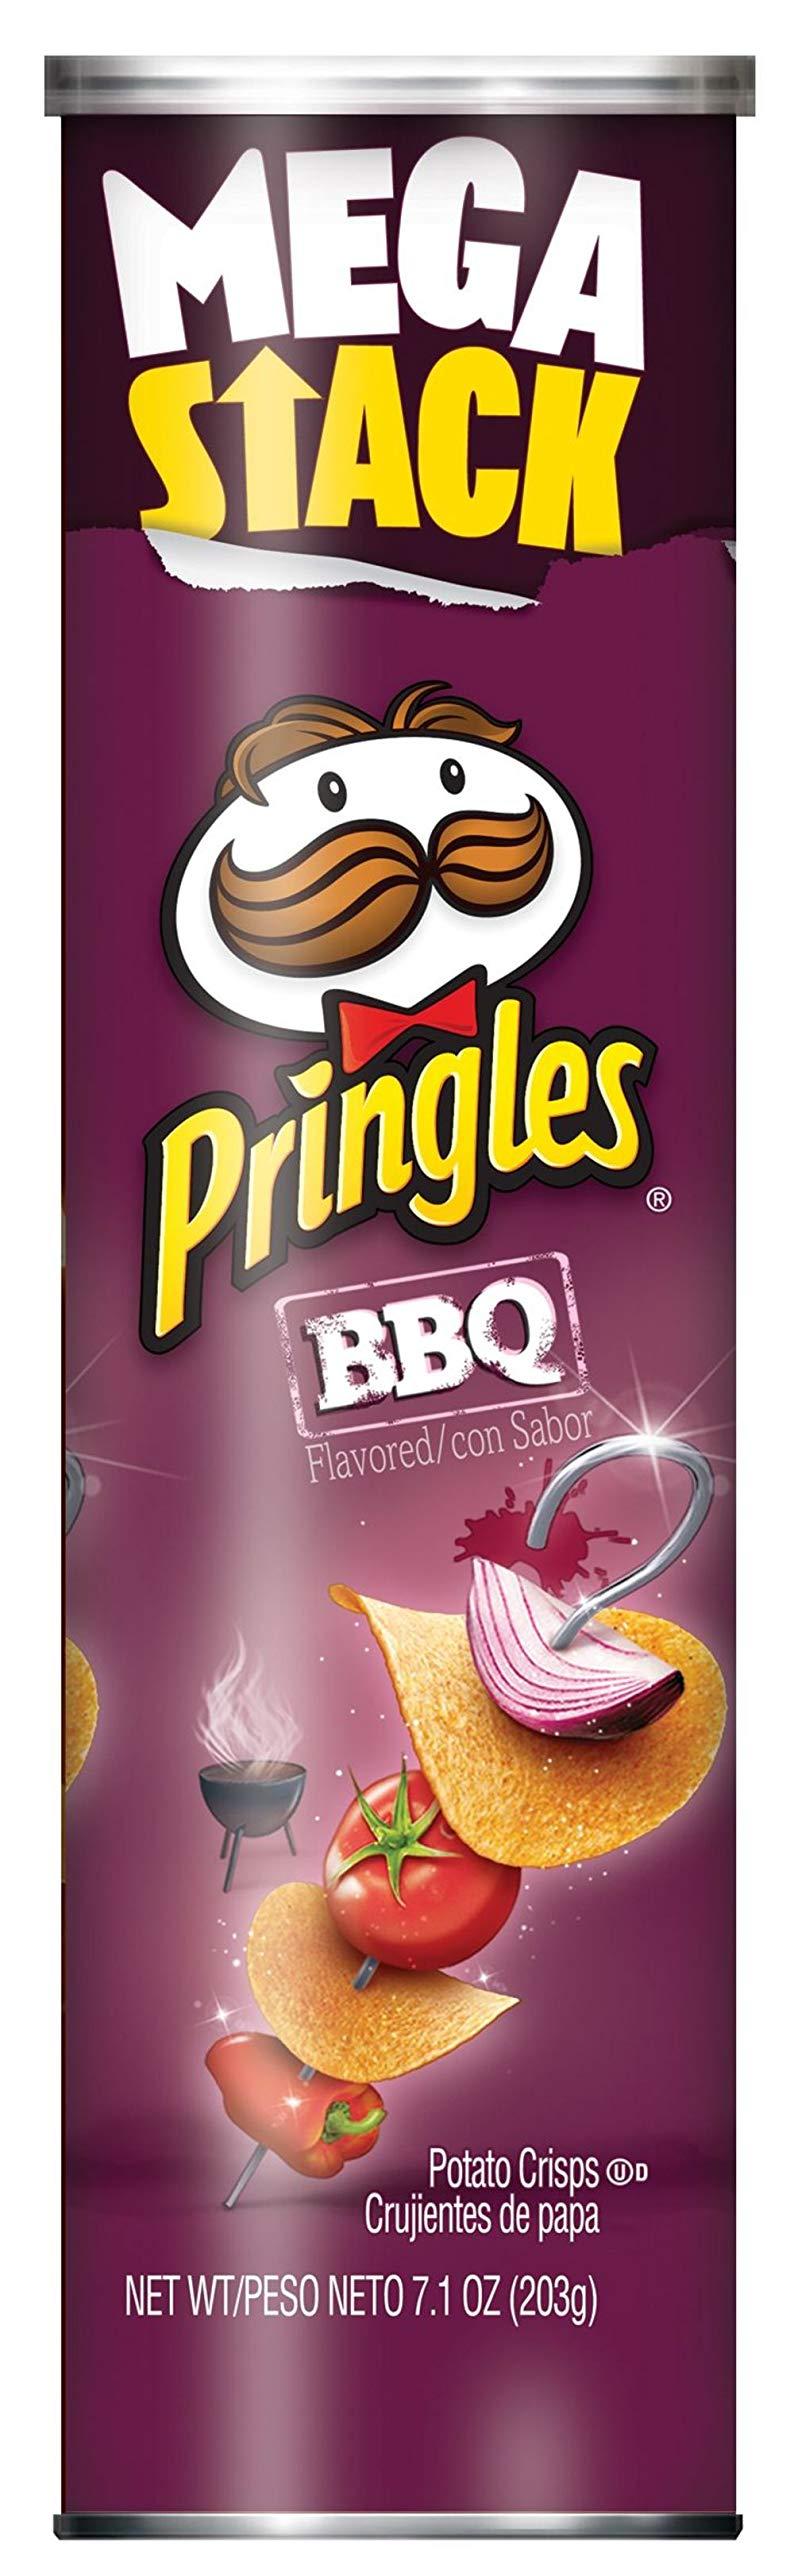 Pringles, Potato Crisps Chips, BBQ Flavored, Mega Stack, 7.1oz Can